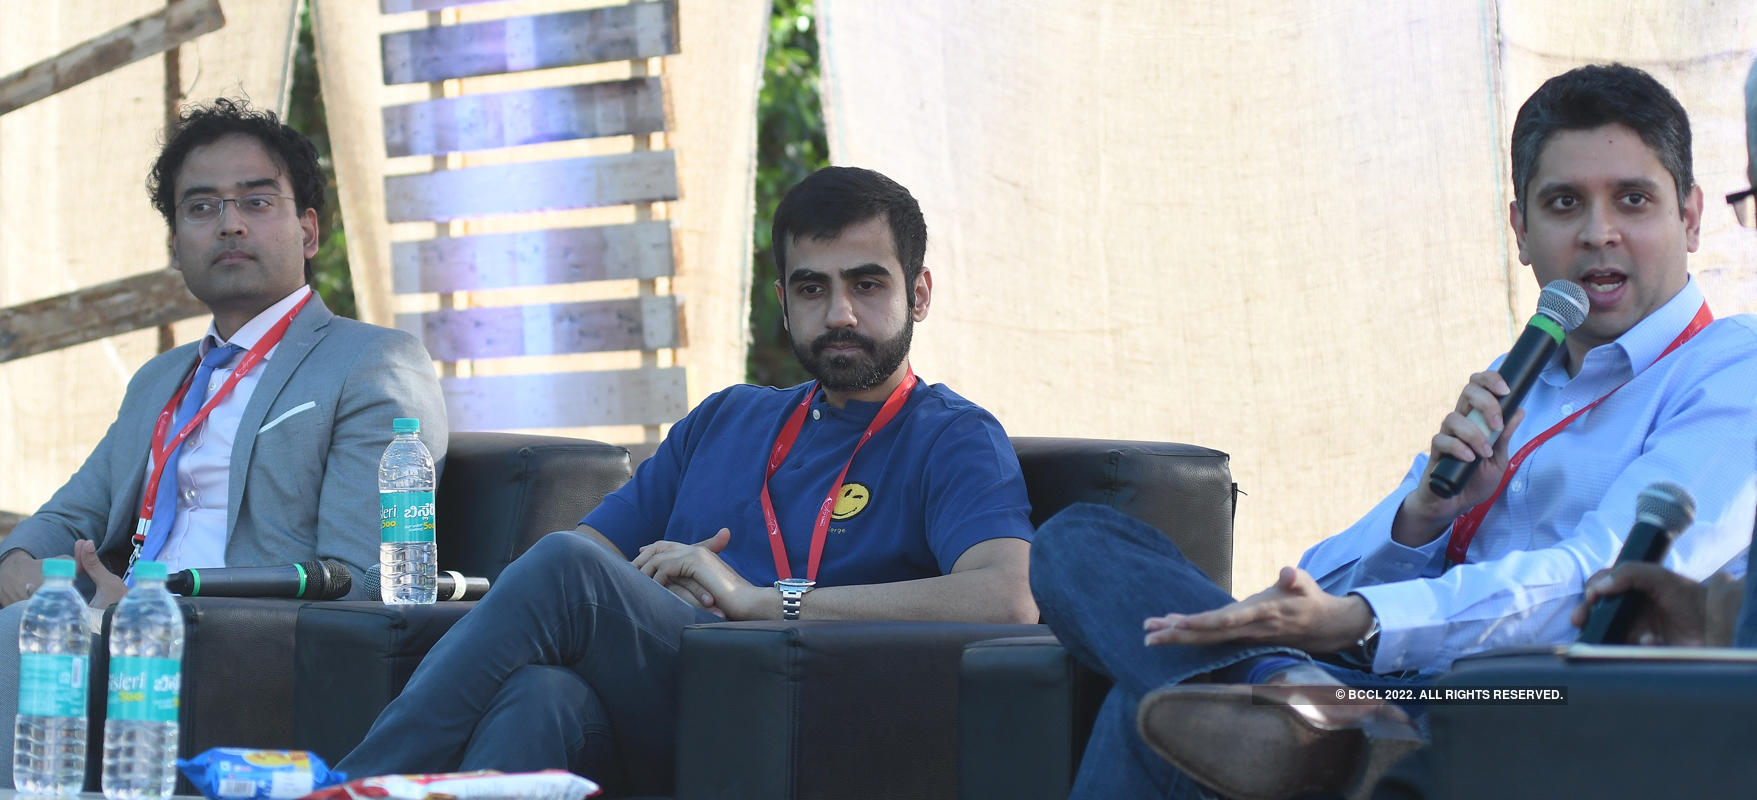 Times Litfest Bengaluru 2019: Day 1